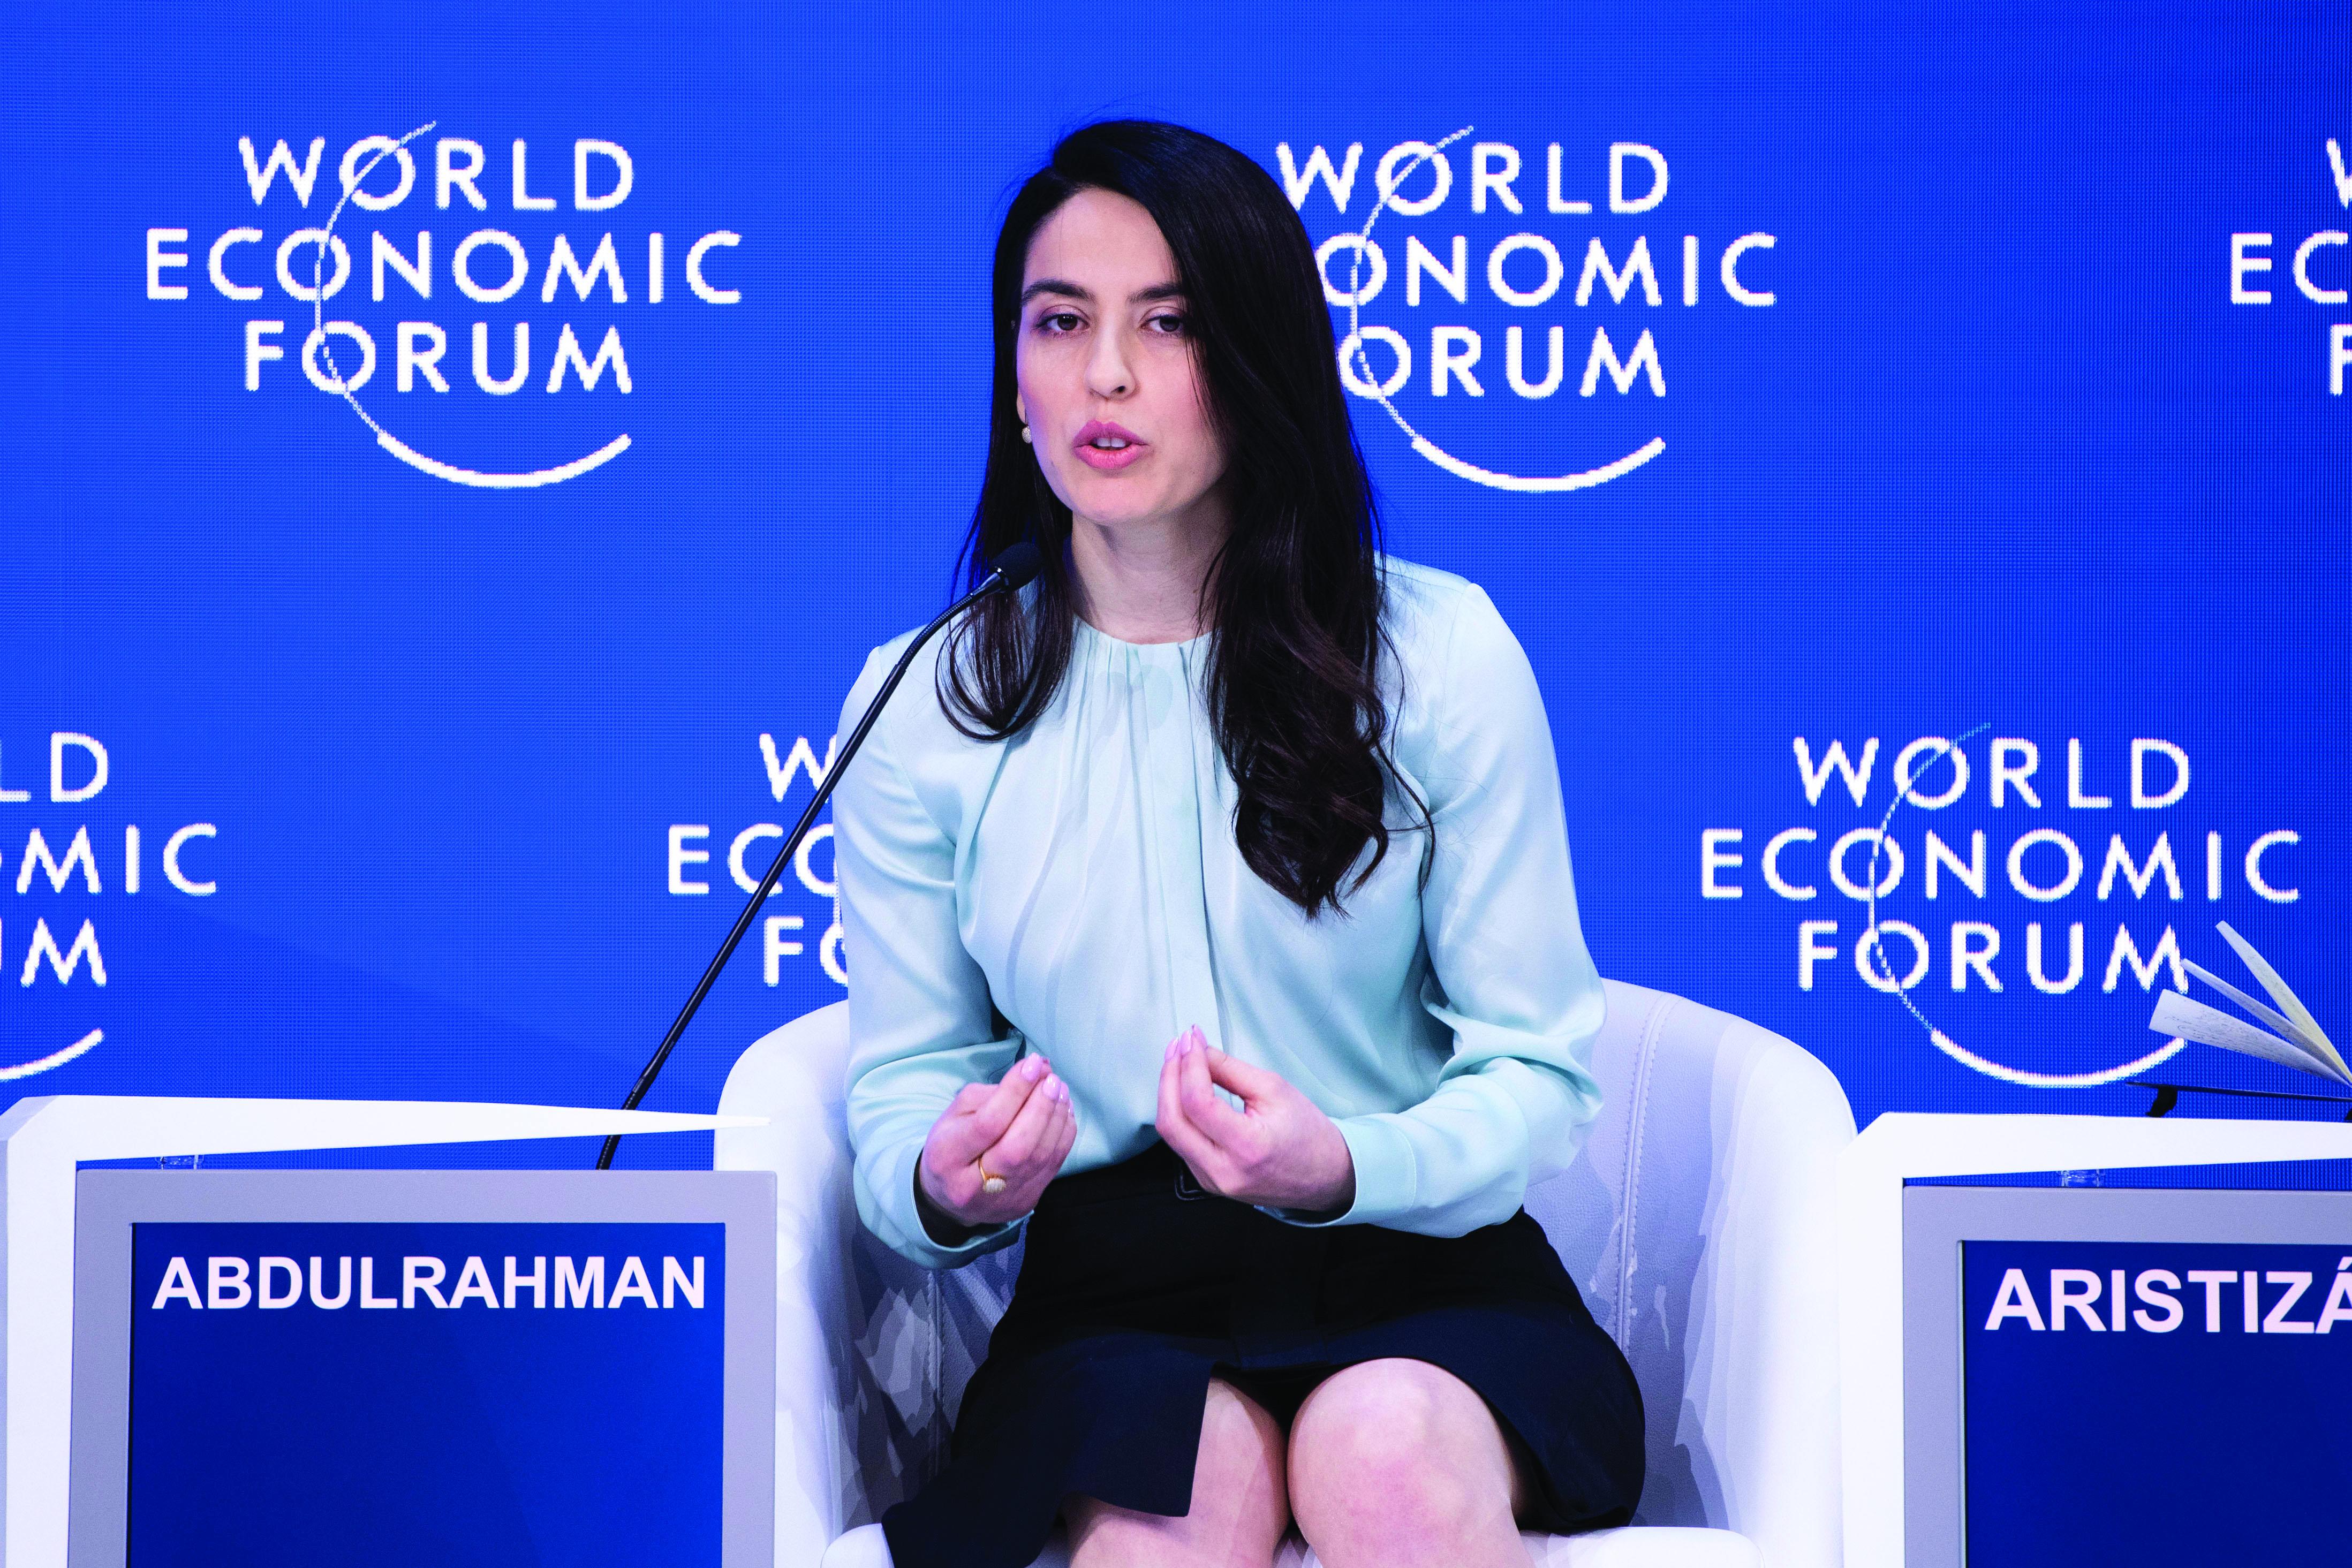 Basima Abdulrahman speaks at the World Economic Forum.